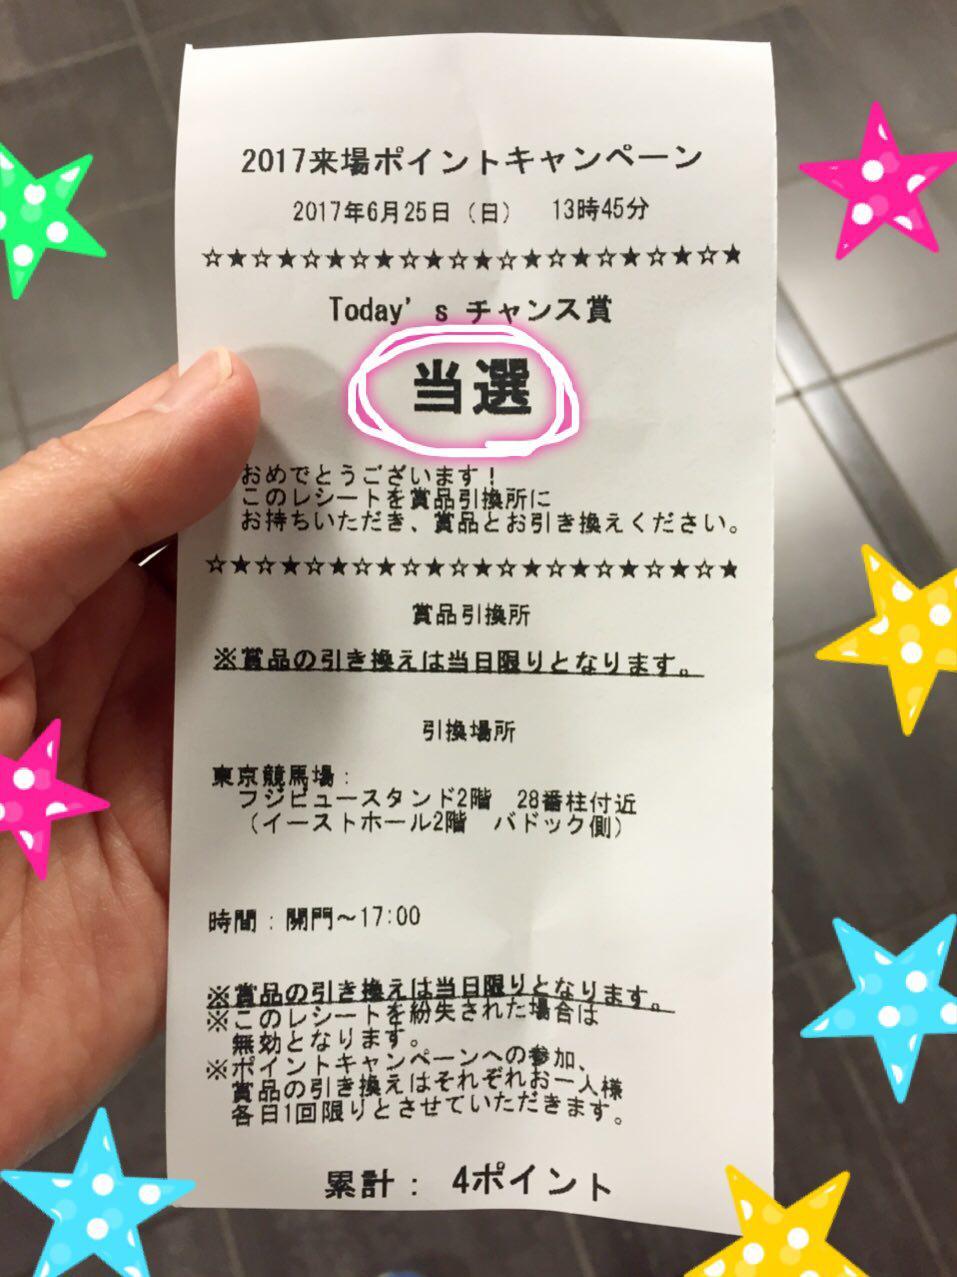 photo_2017-06-26_00-18-53.jpg